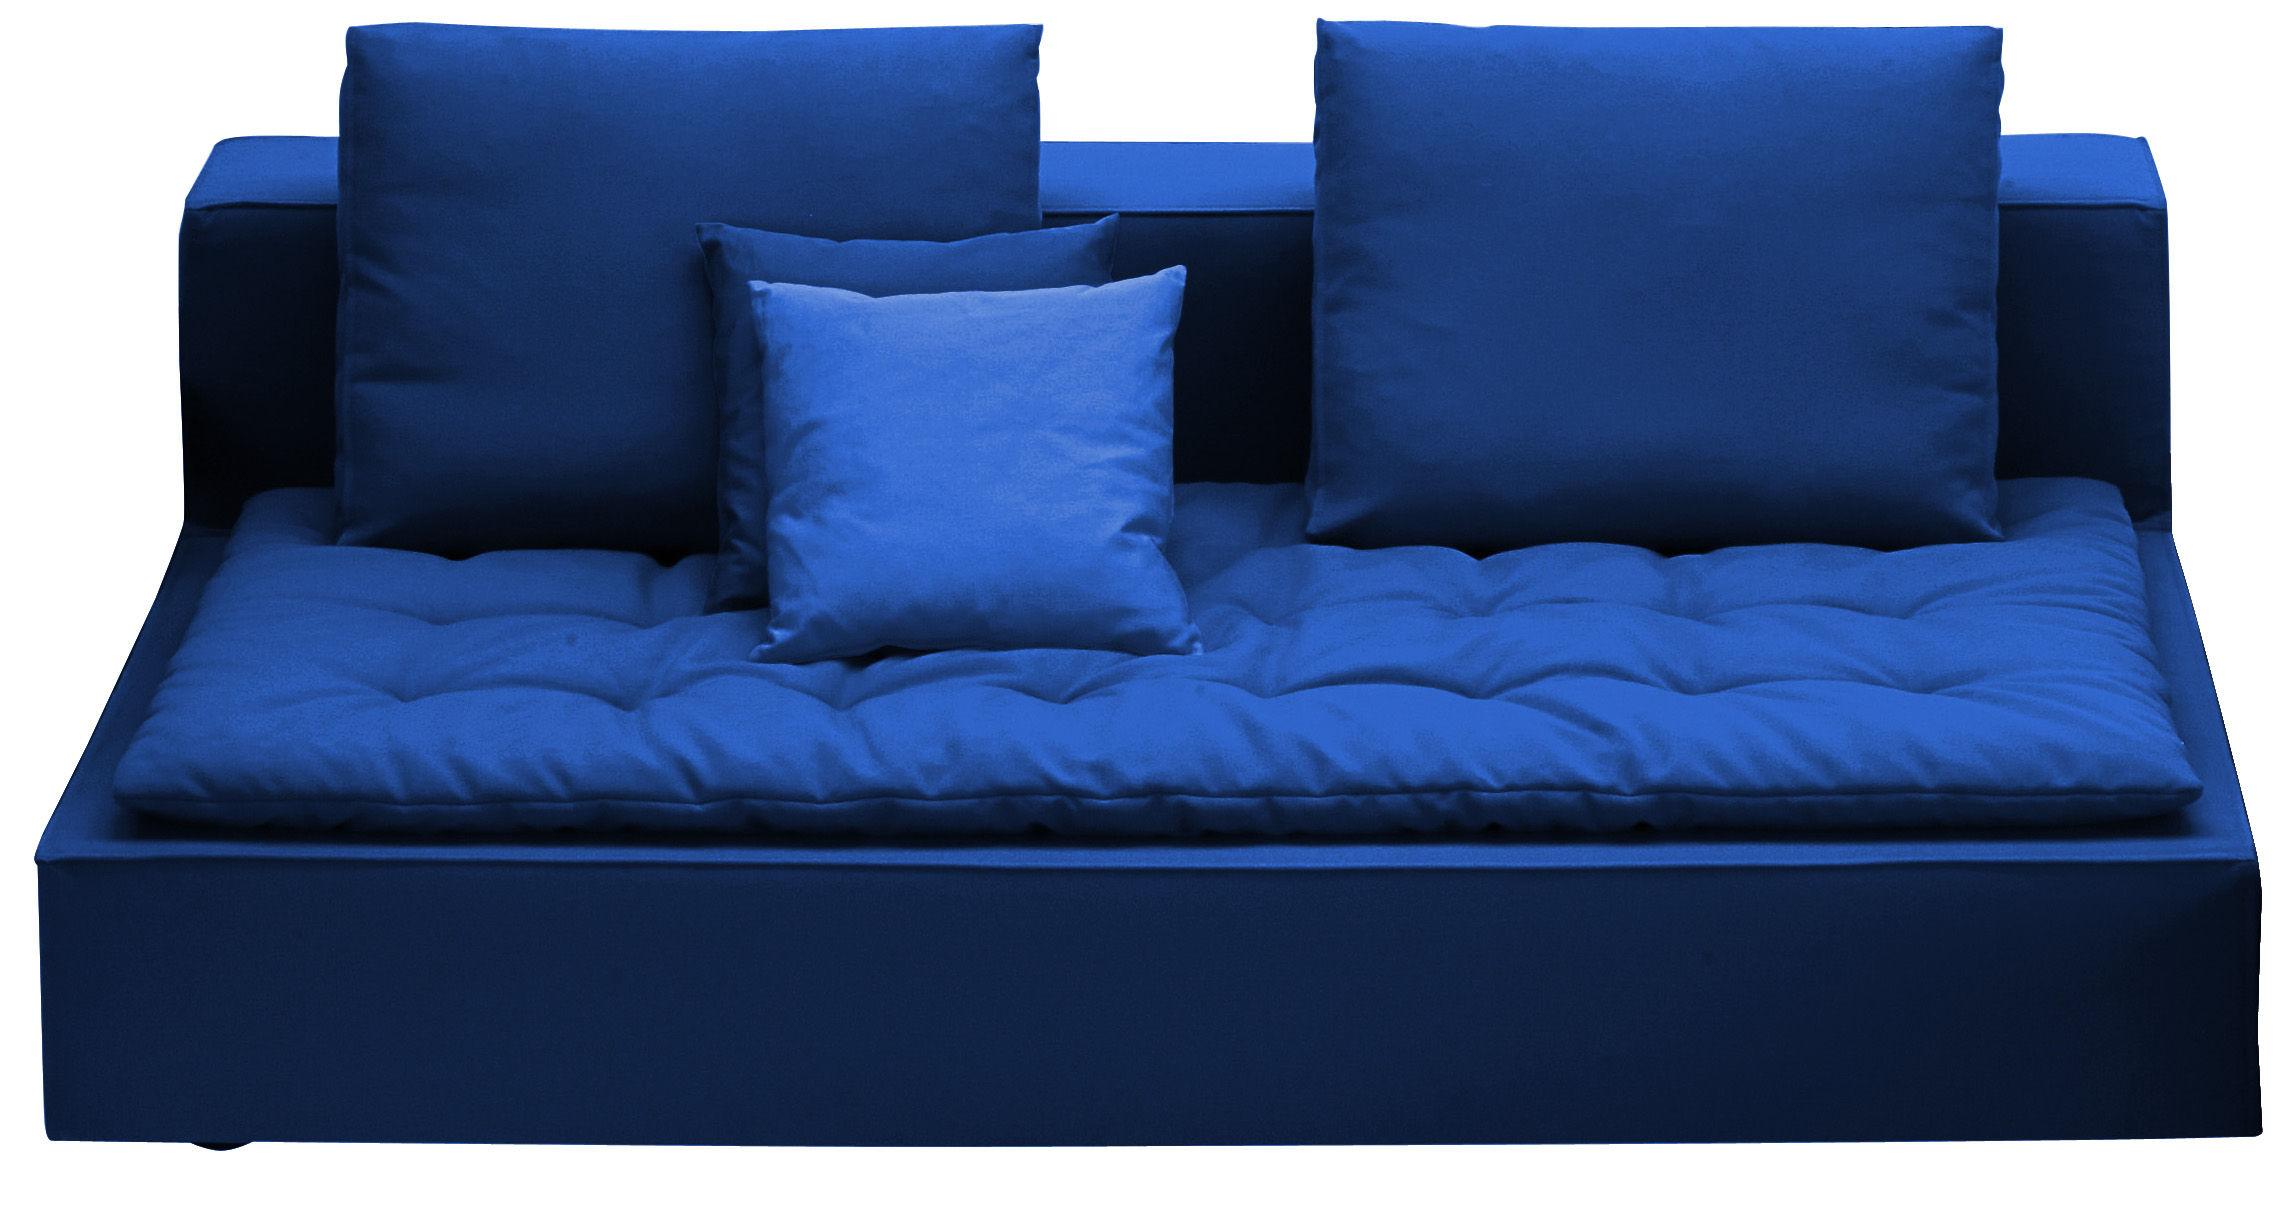 canap droit domino l 223 cm bleu fonc zanotta made in design. Black Bedroom Furniture Sets. Home Design Ideas